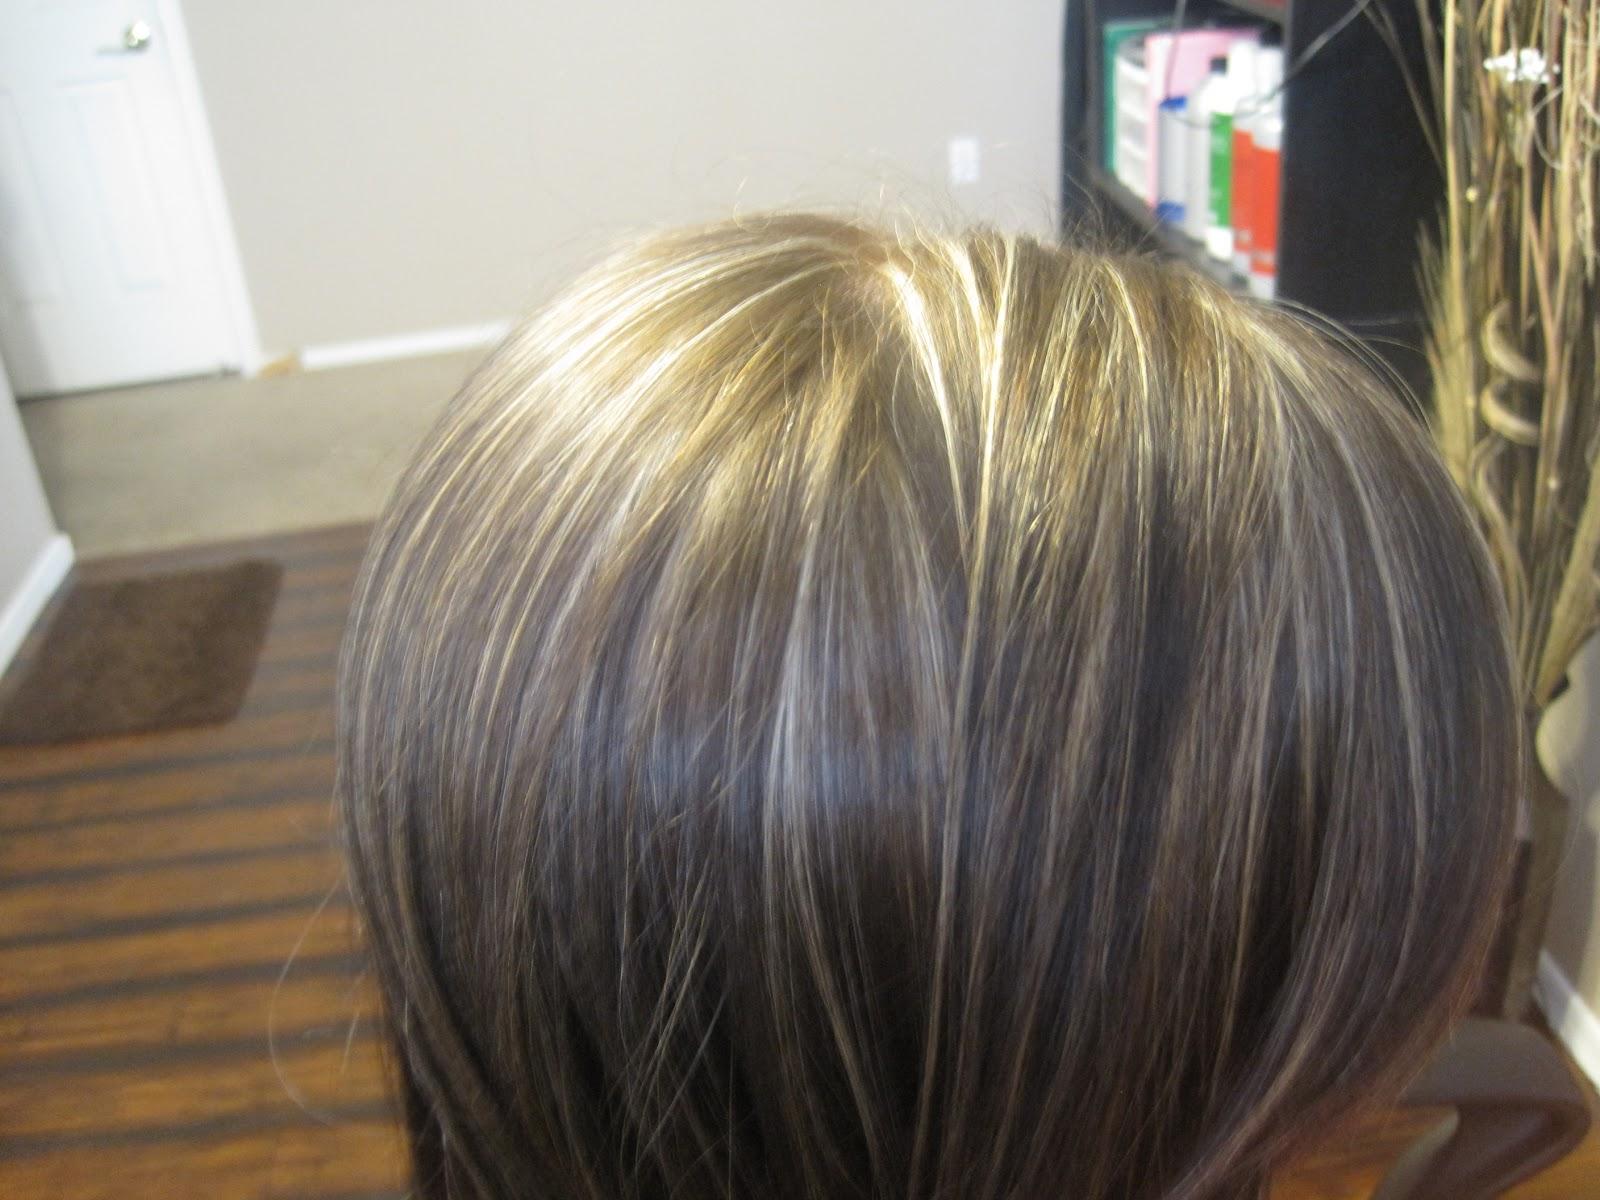 28 Low Lights In Grey Hair Newhairstylesformen2014